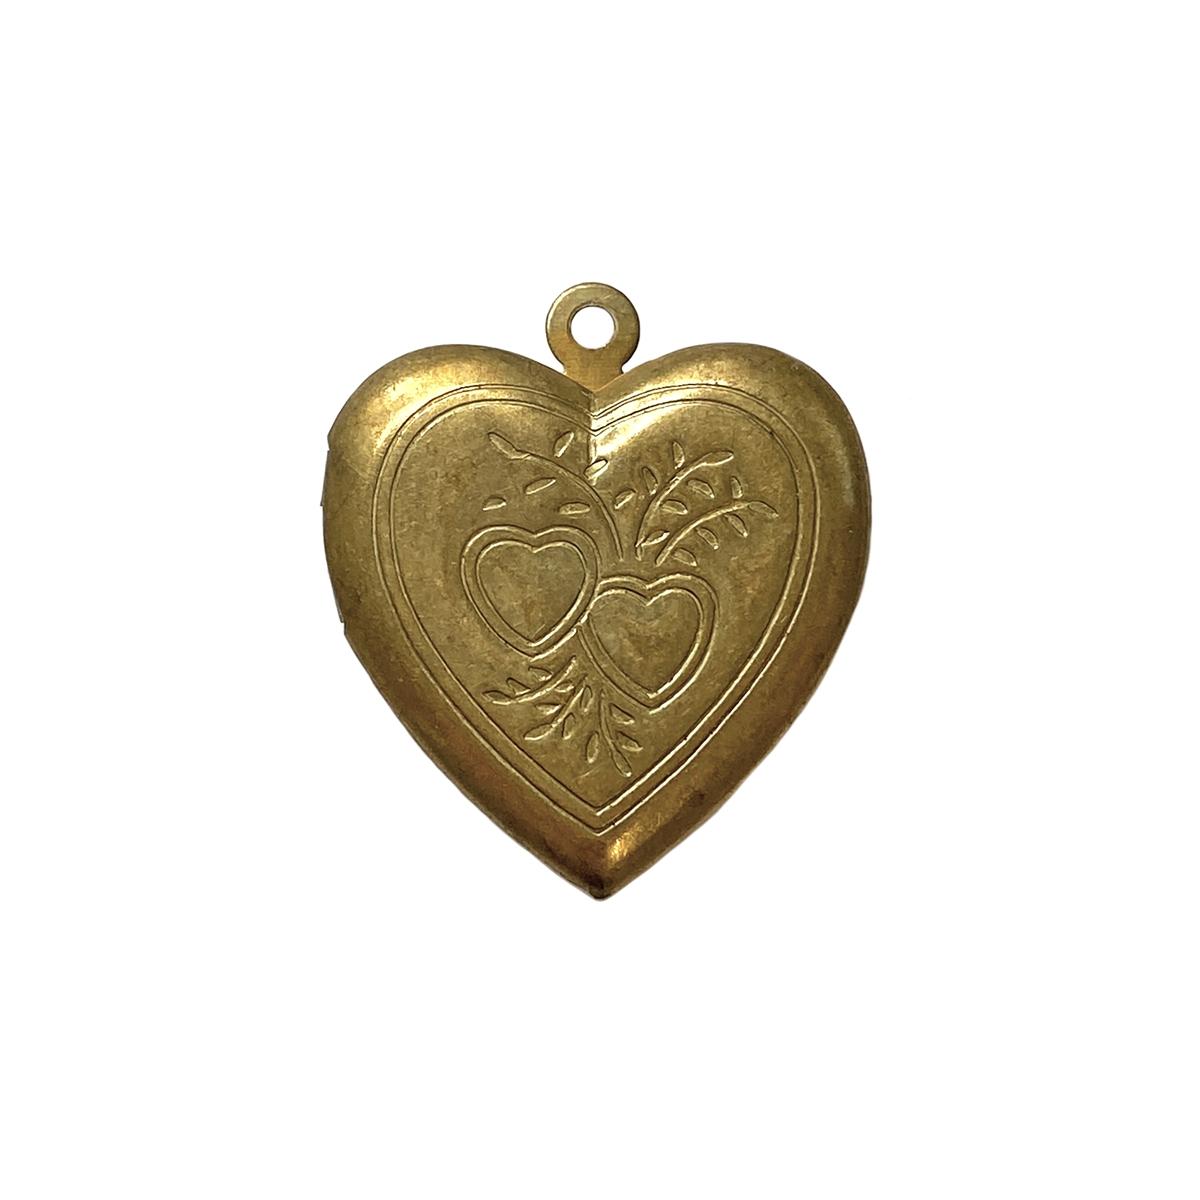 Vintage Heart Locket Double Heart Pattern Locket Heart Locket Raw Brass Charm Pendant Patina Brass Vintage